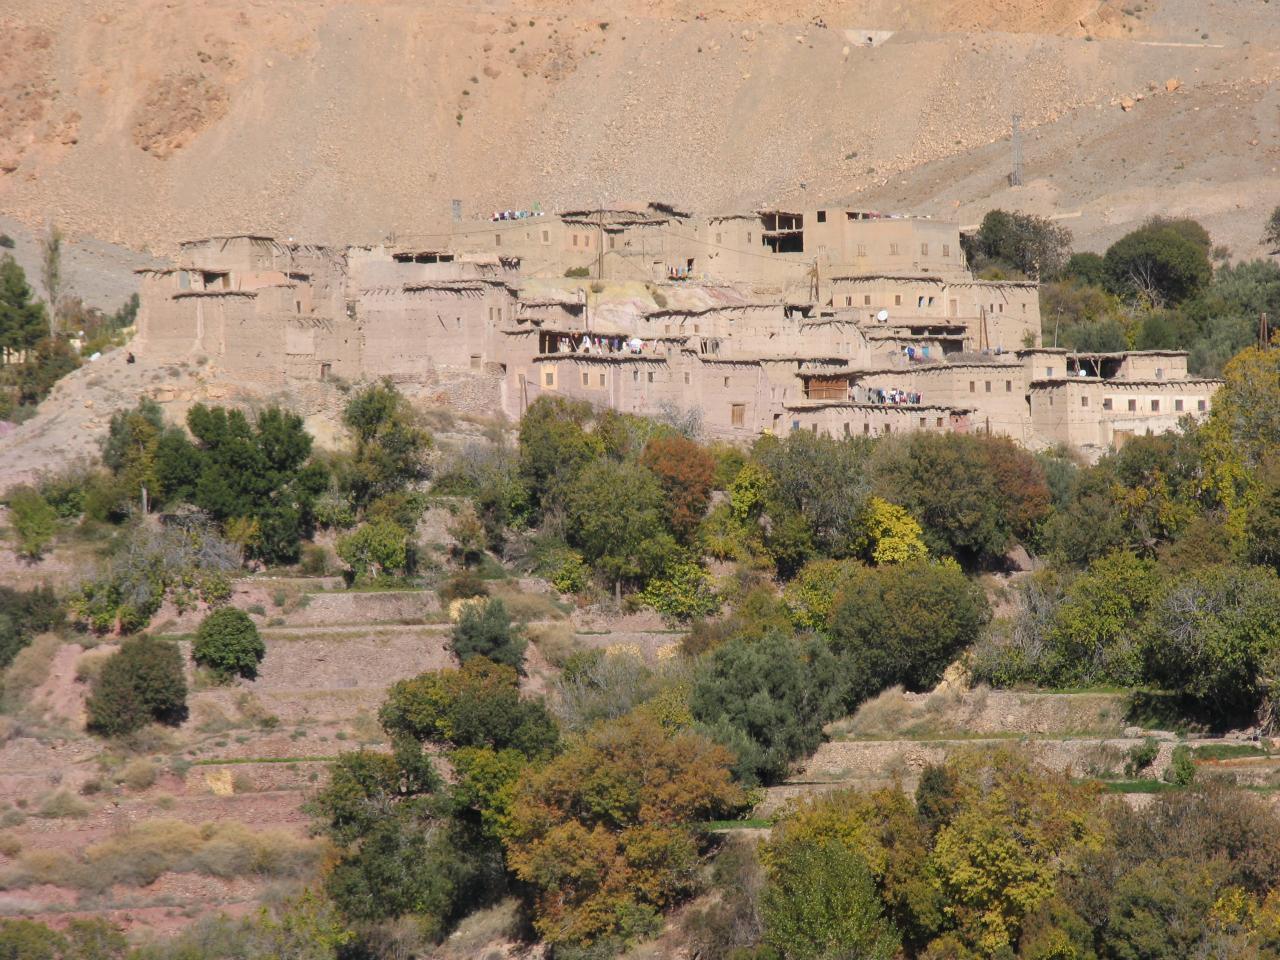 Outat-Oulad-El-Haj El Kébir (Oulad-ali)